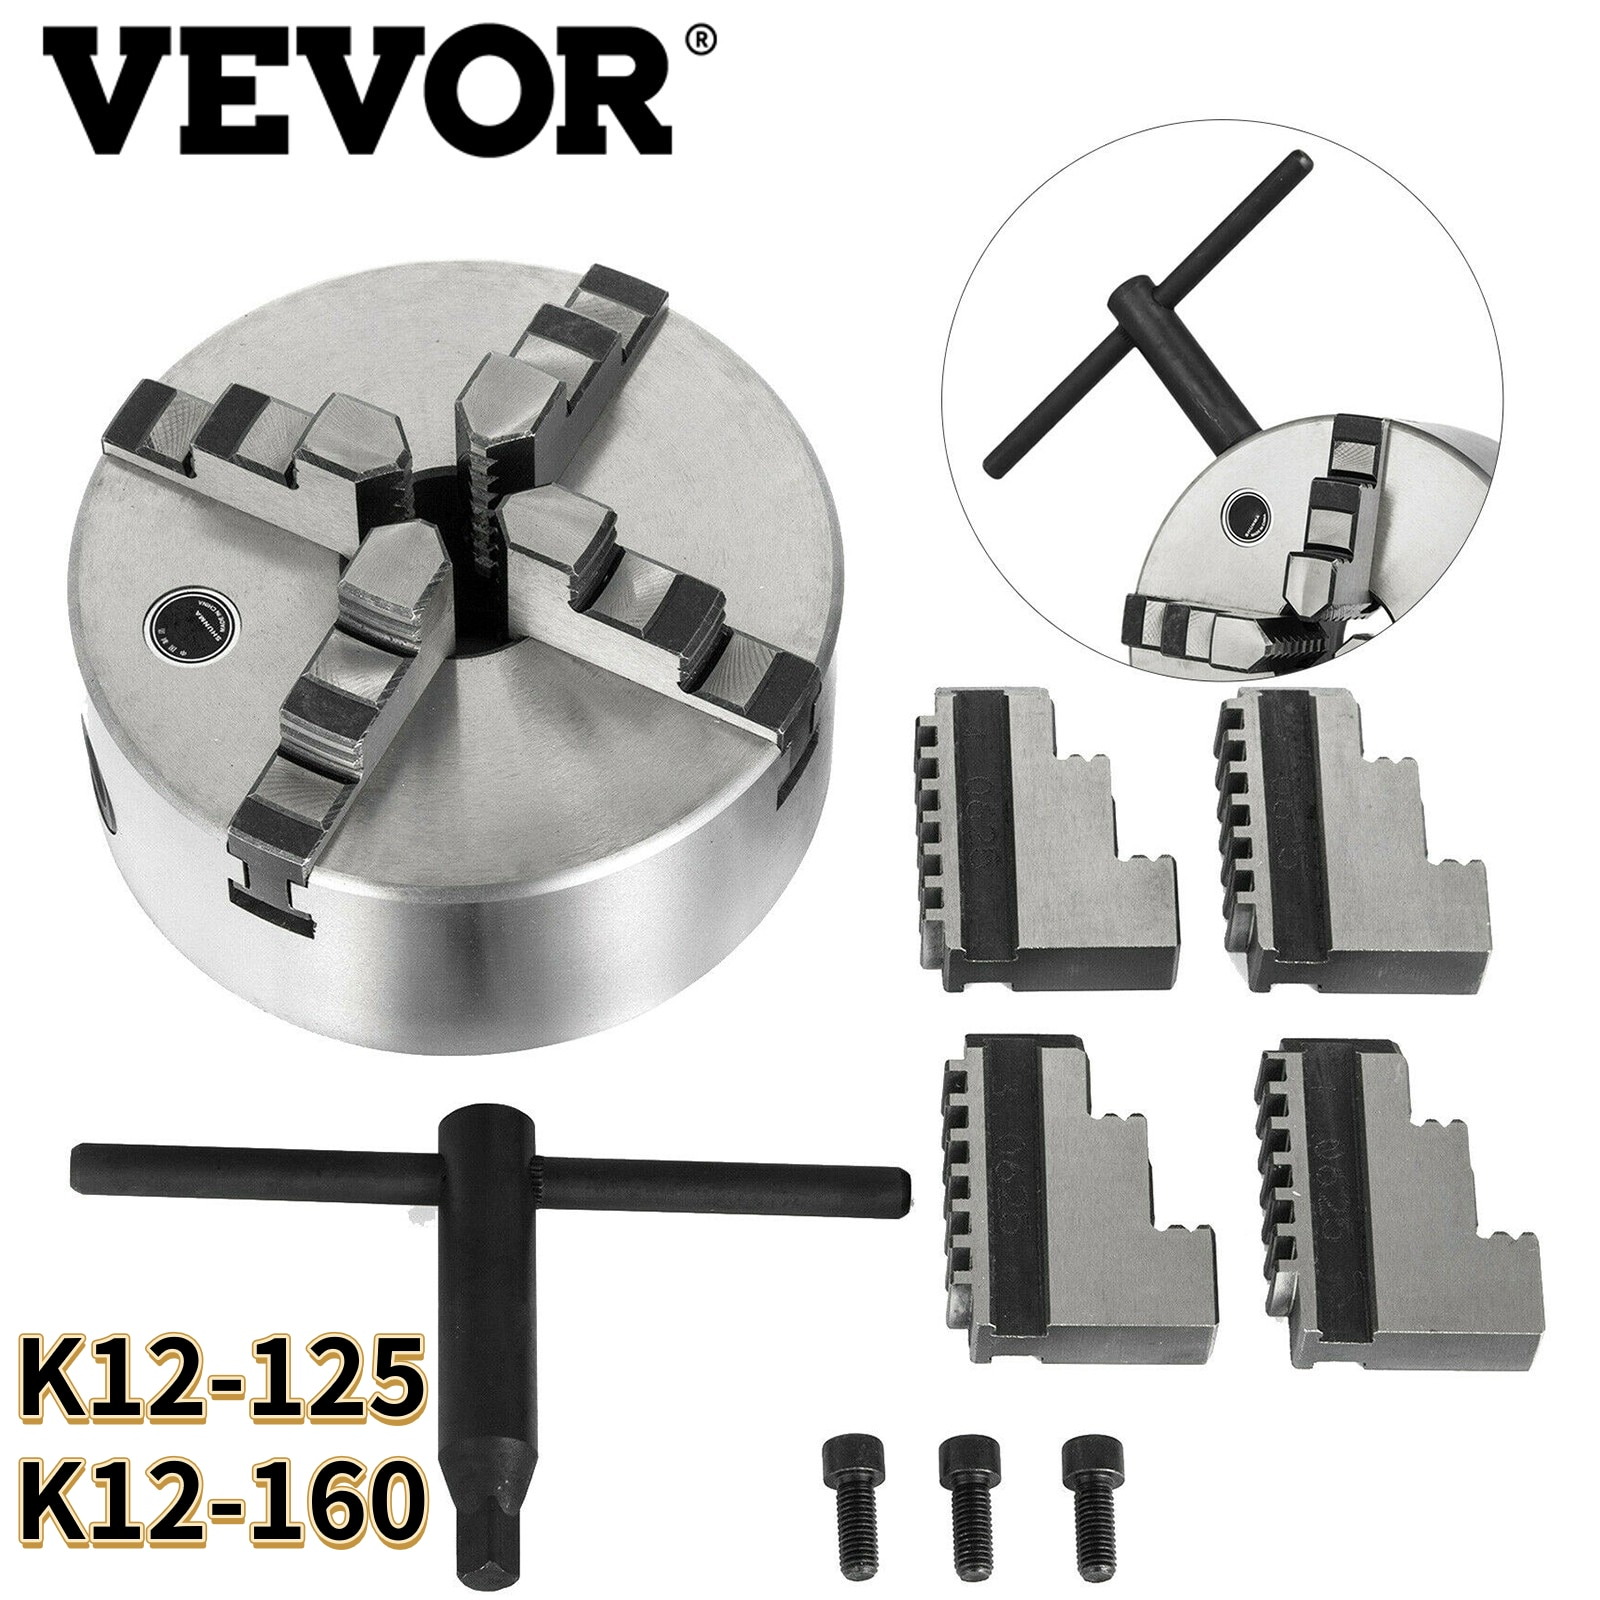 VEVOR 4 الفك الذاتي توسيط آلة خراطة يدوية تشاك ث/3 قطعة تصاعد الترباس K12-125 K12-160 لطحن آلات طحن عالية الدقة